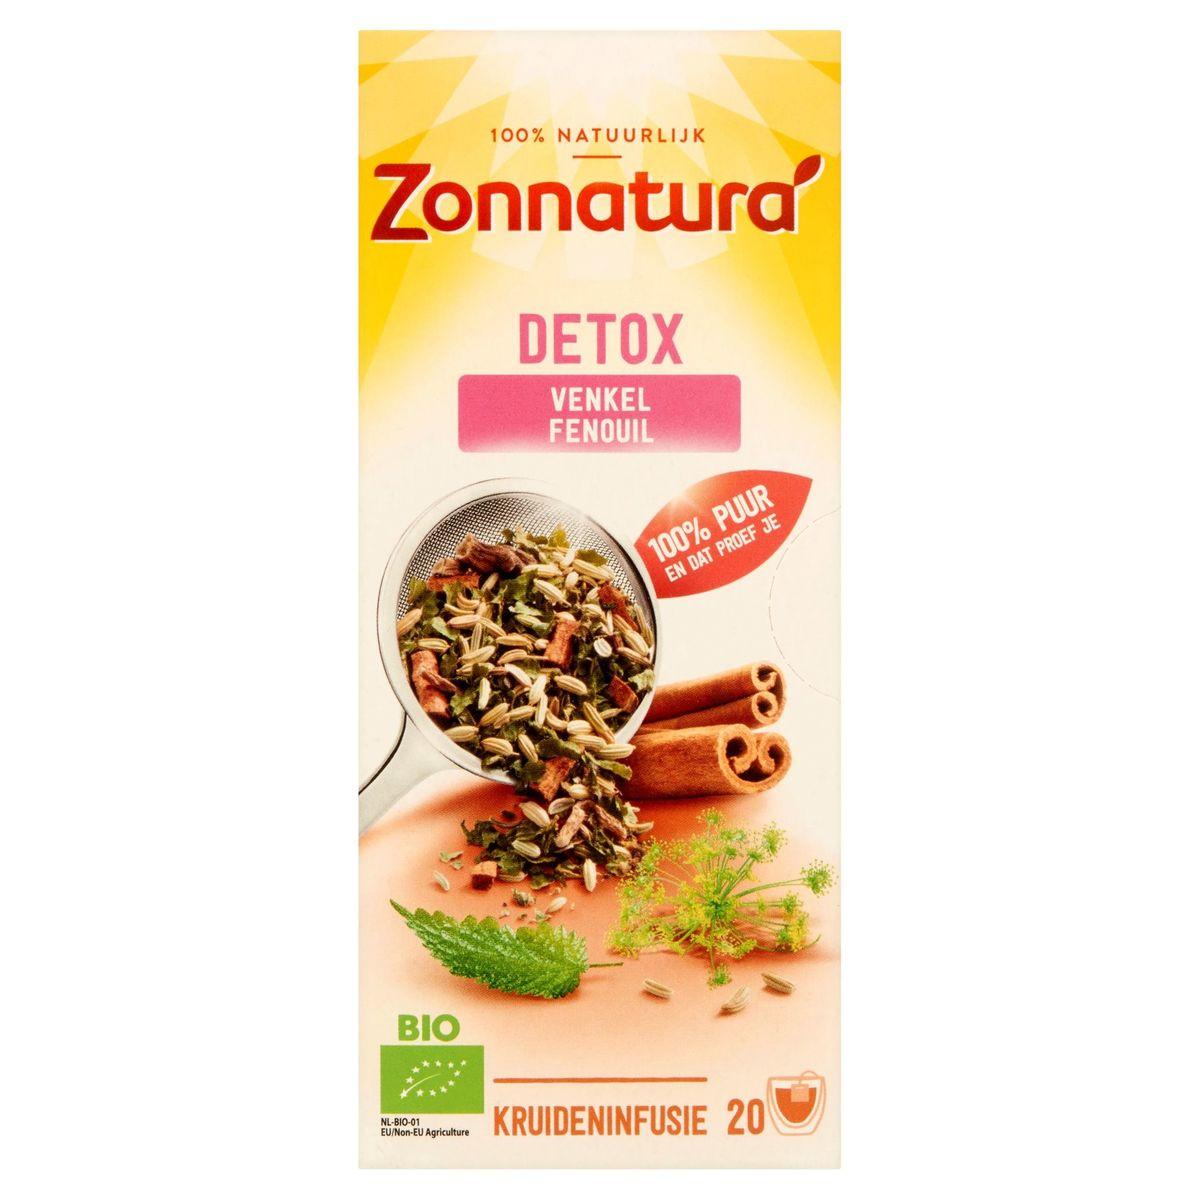 Zonnatura Detox Fenouil 20 Sachets 34 g